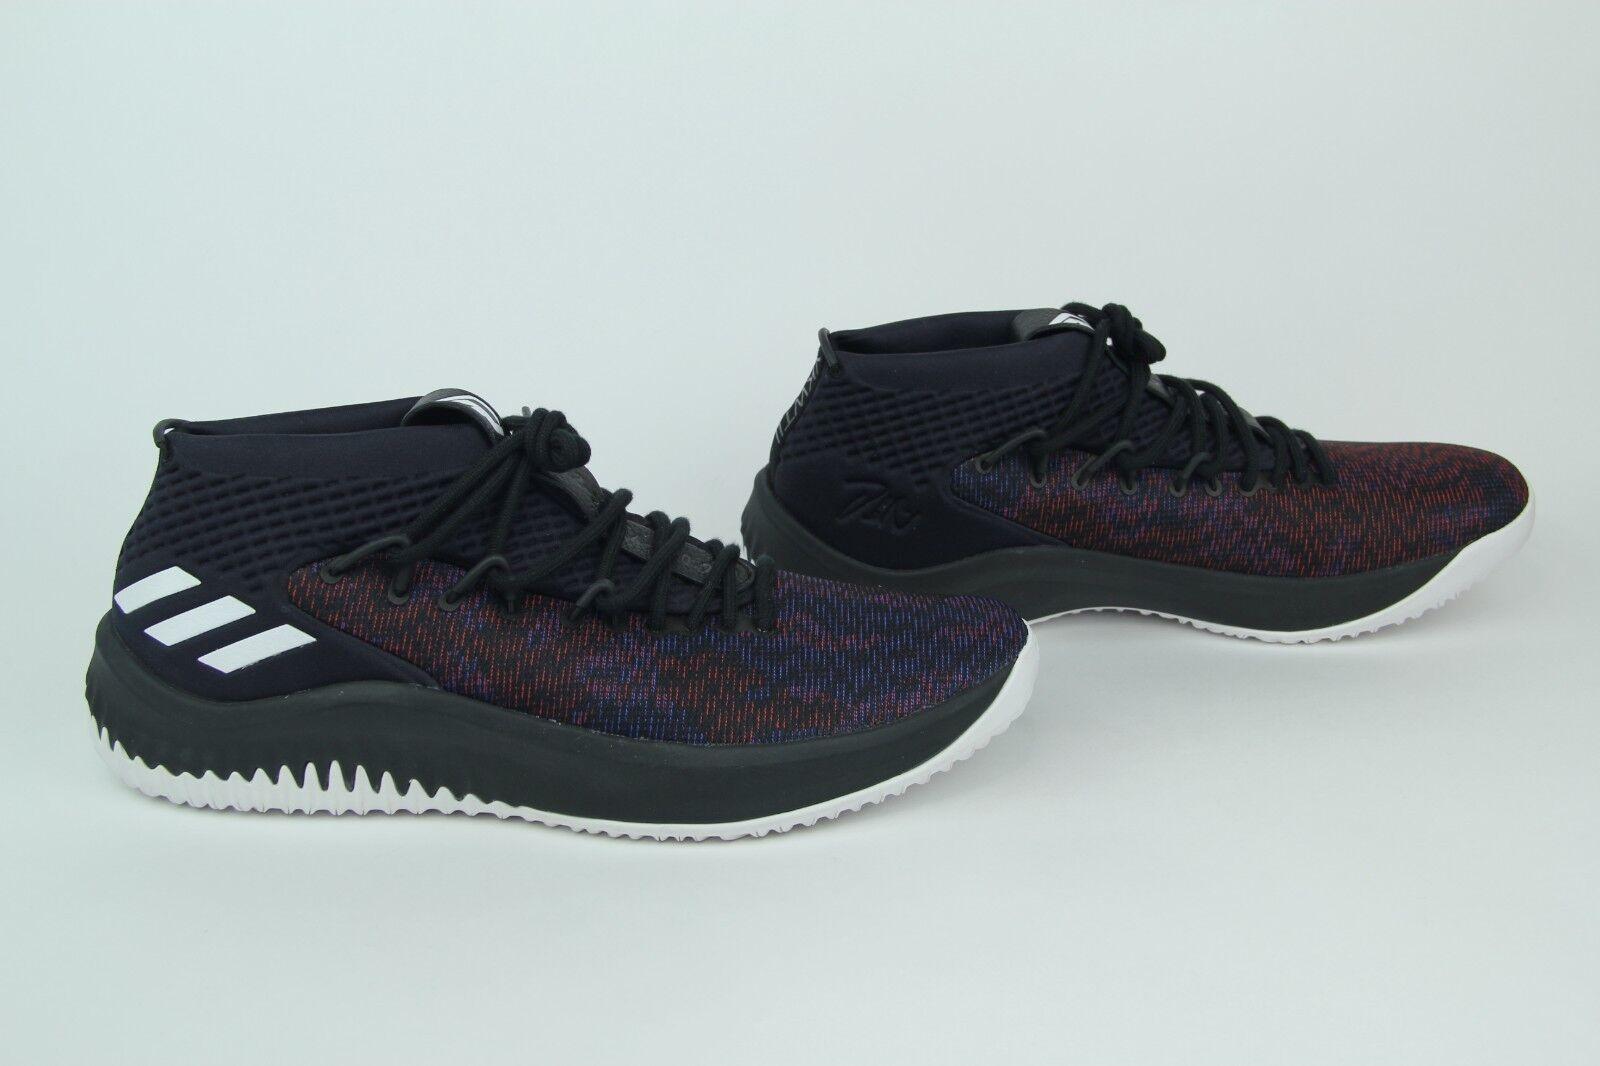 eda6604d1db7c ... Adidas Dame Lillard Lillard Lillard 4 Men s Basketball shoes Core Black  White CQ0477 SIZE 14 New ...